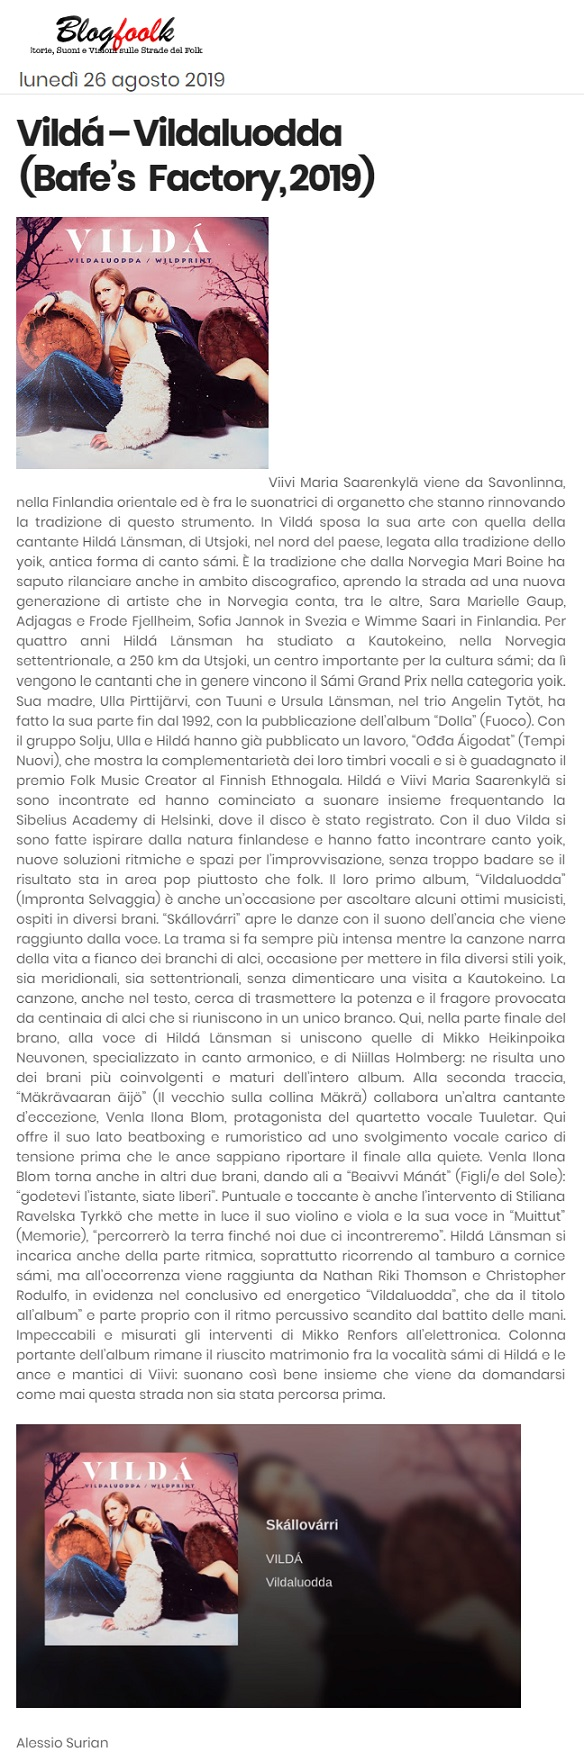 Blogfoolk (Italy), 26.8.2019